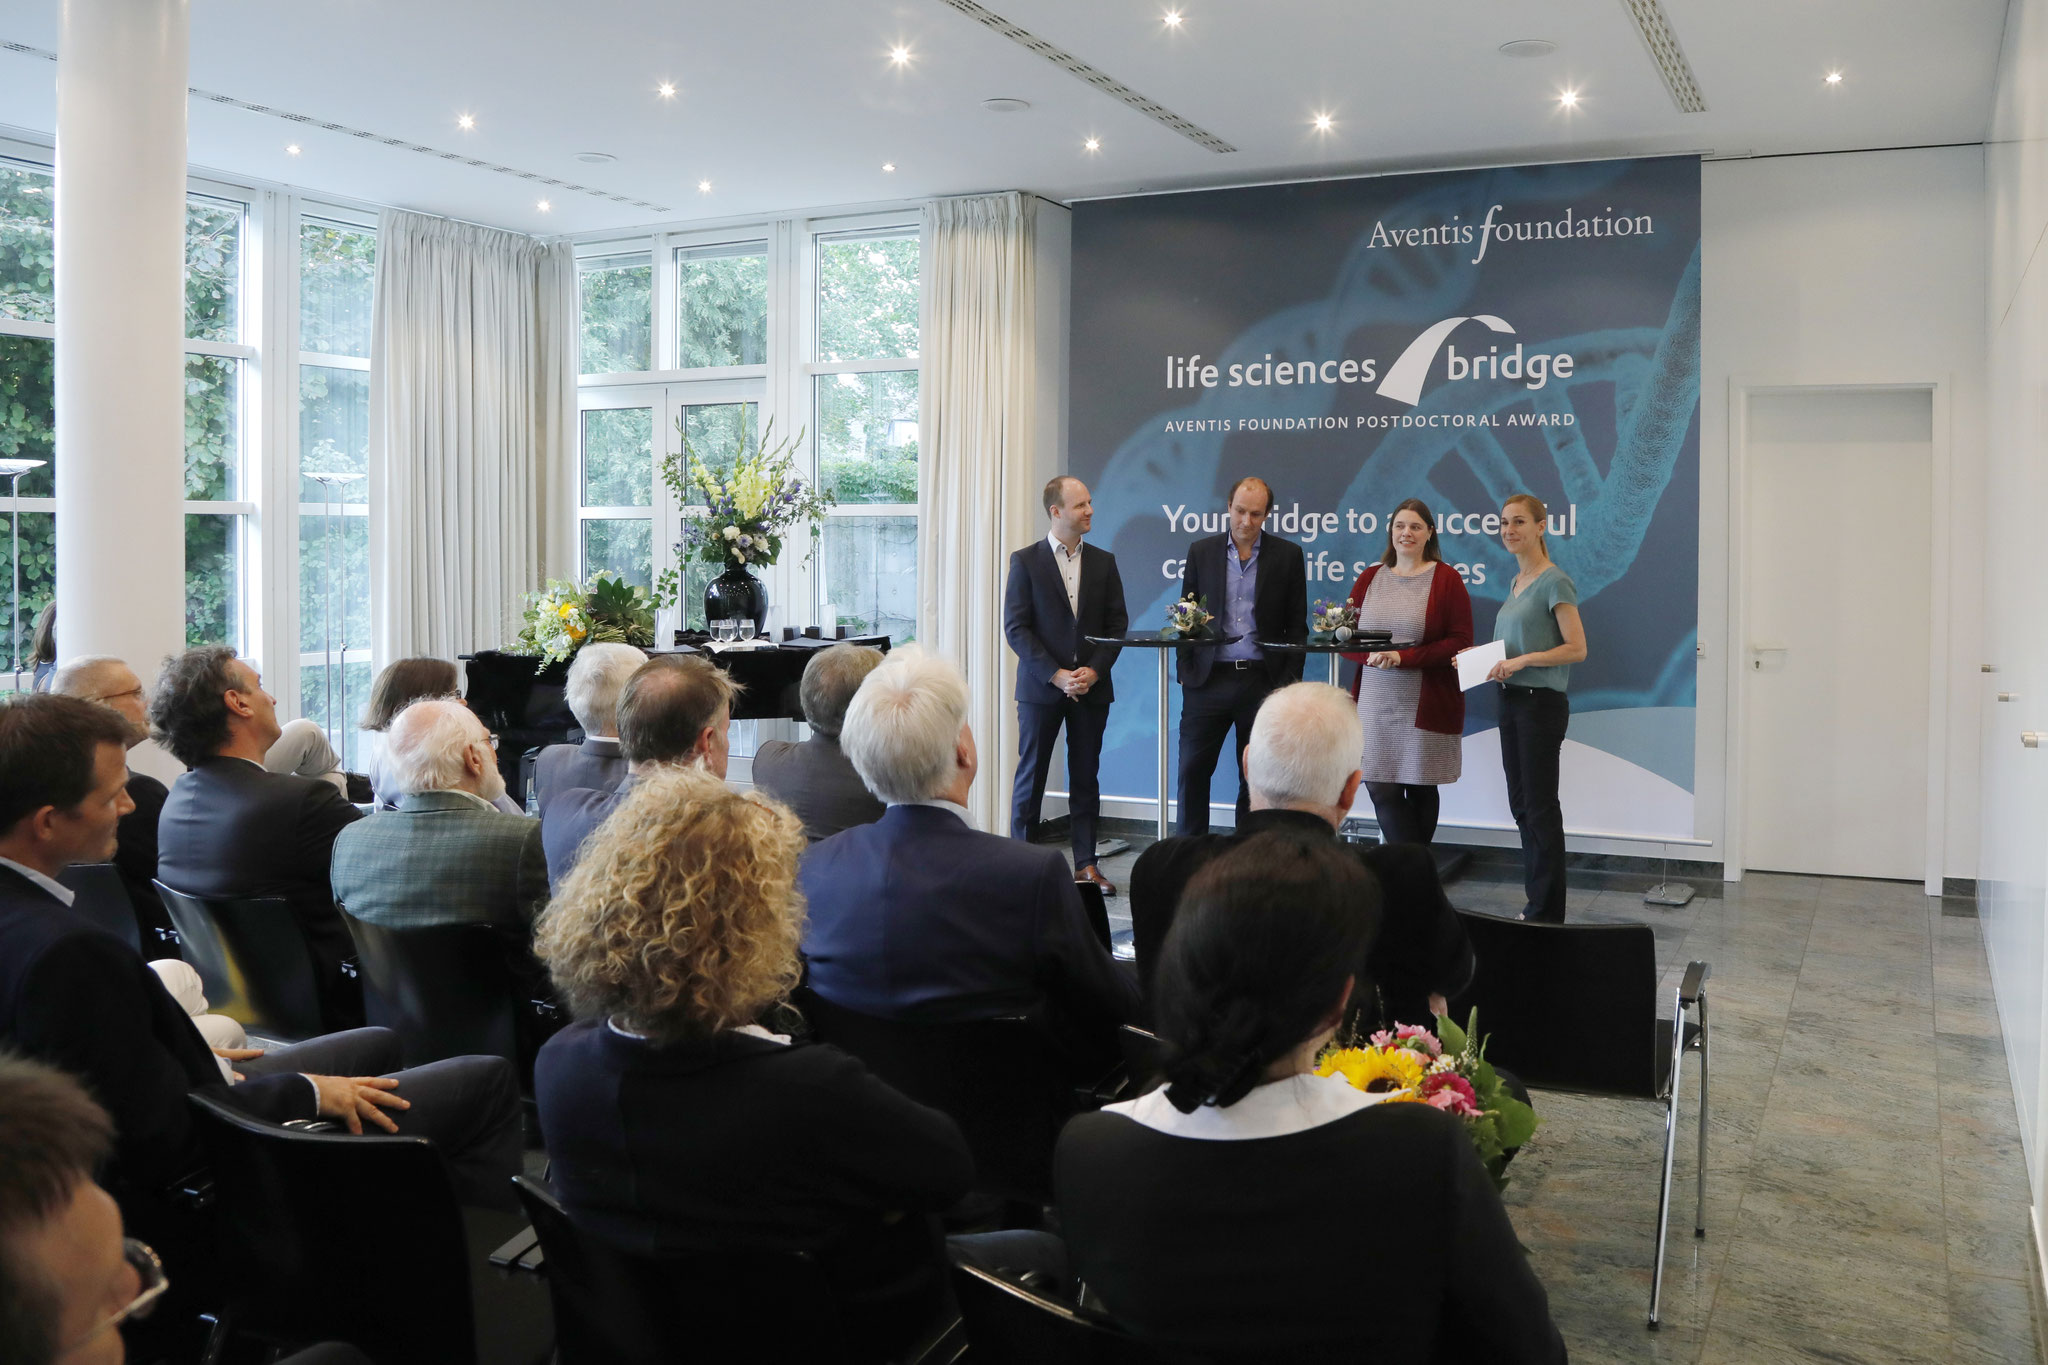 Preisverleihung Aventis Foundation Postdoctoral Award 2019 @Uwe Dettmar